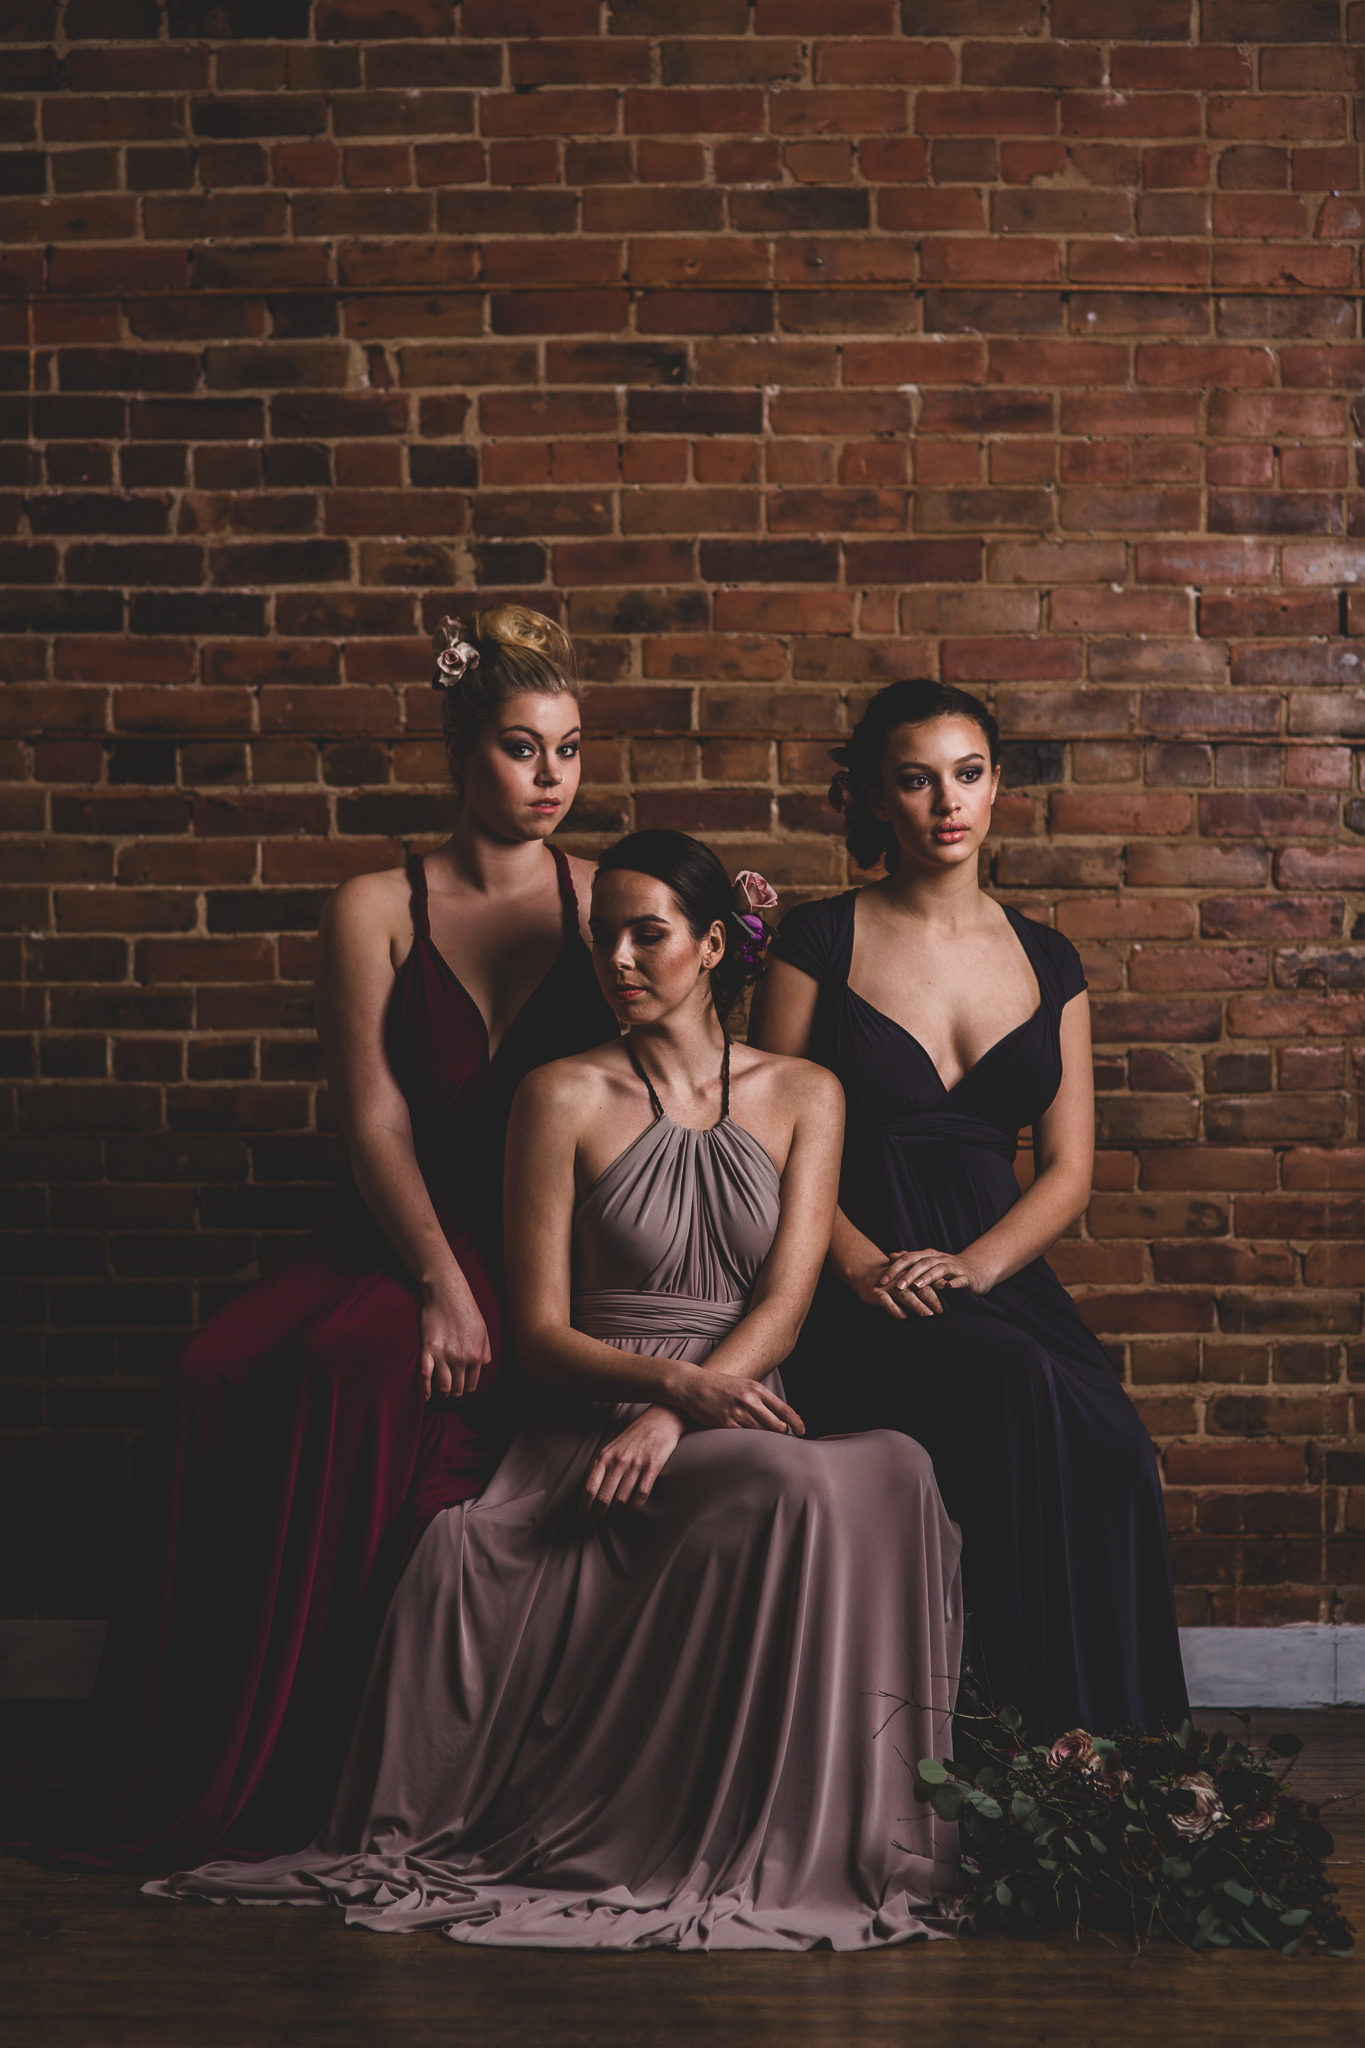 Arroh and Bow bridal dresses